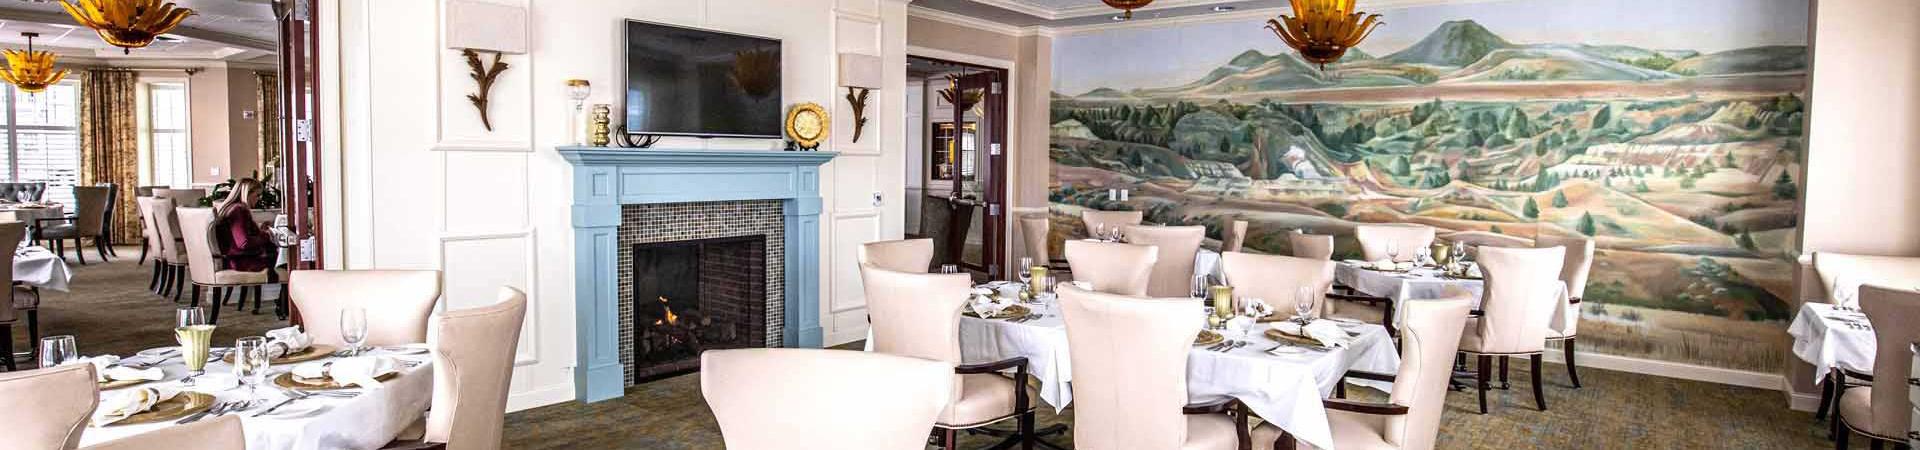 Grand-Living-Lake-Lorraine-Dining-1920x450